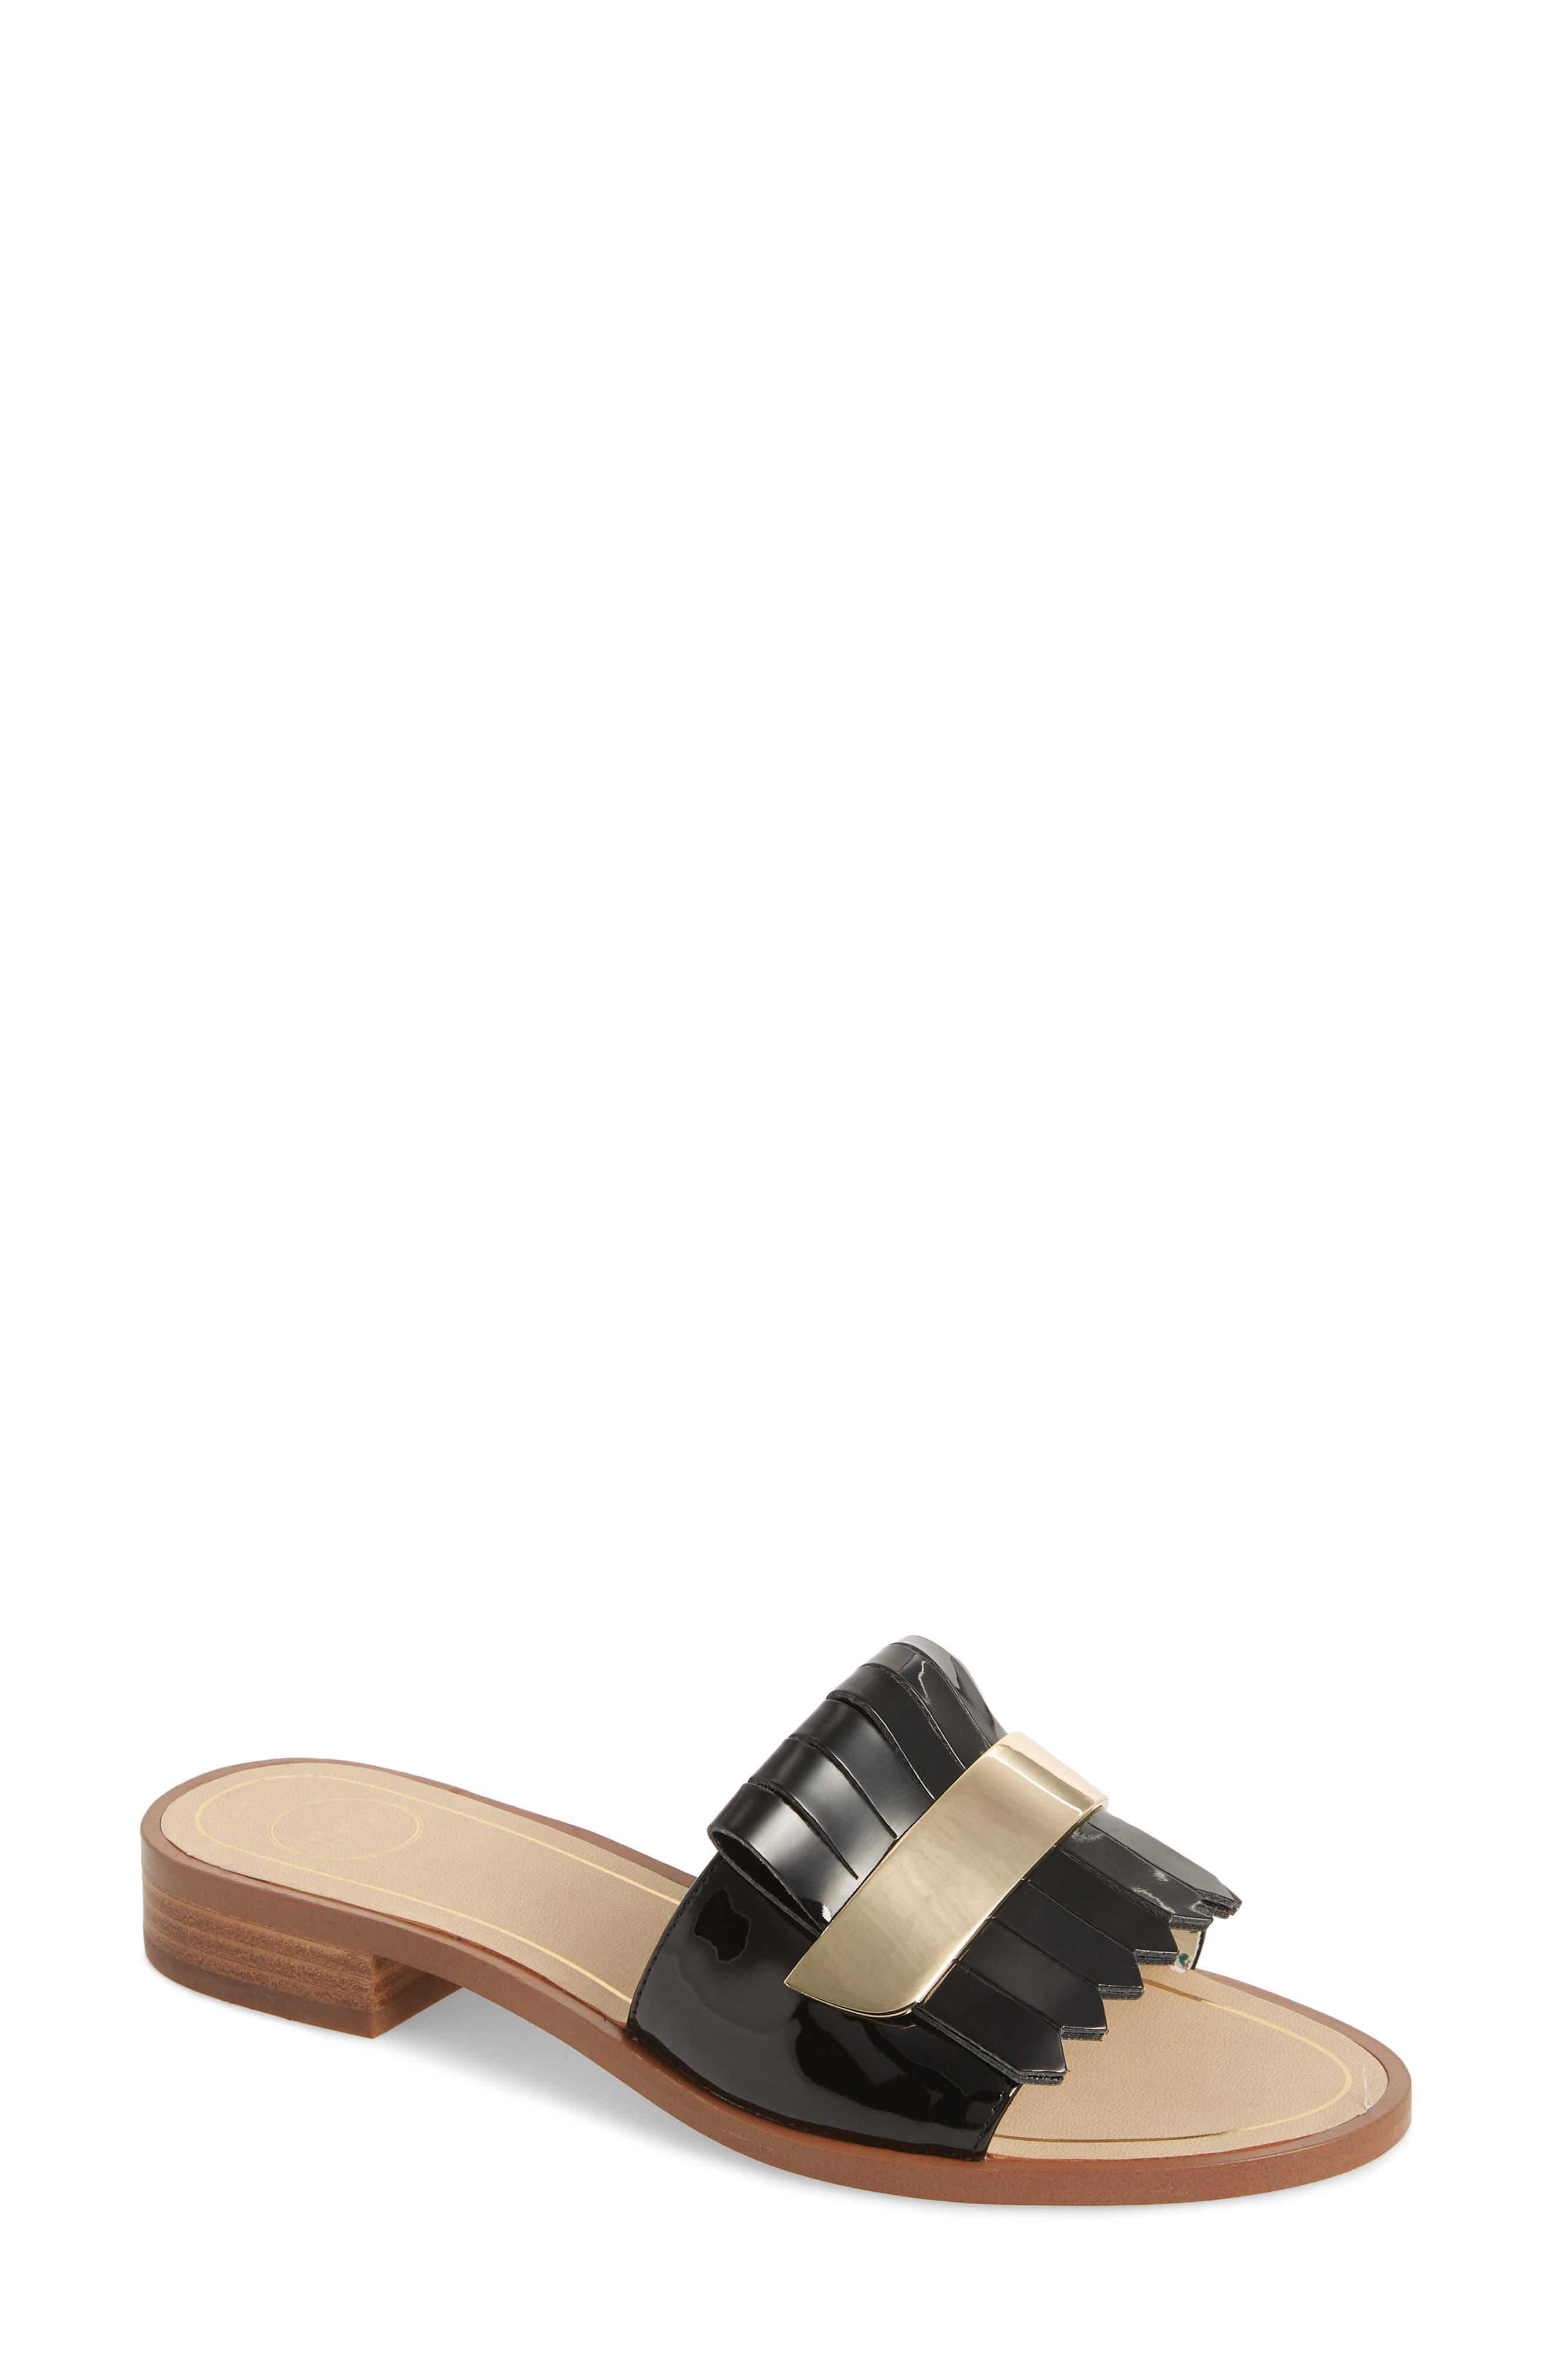 Aldrich Slide Sandal,                         Main,                         color, 002